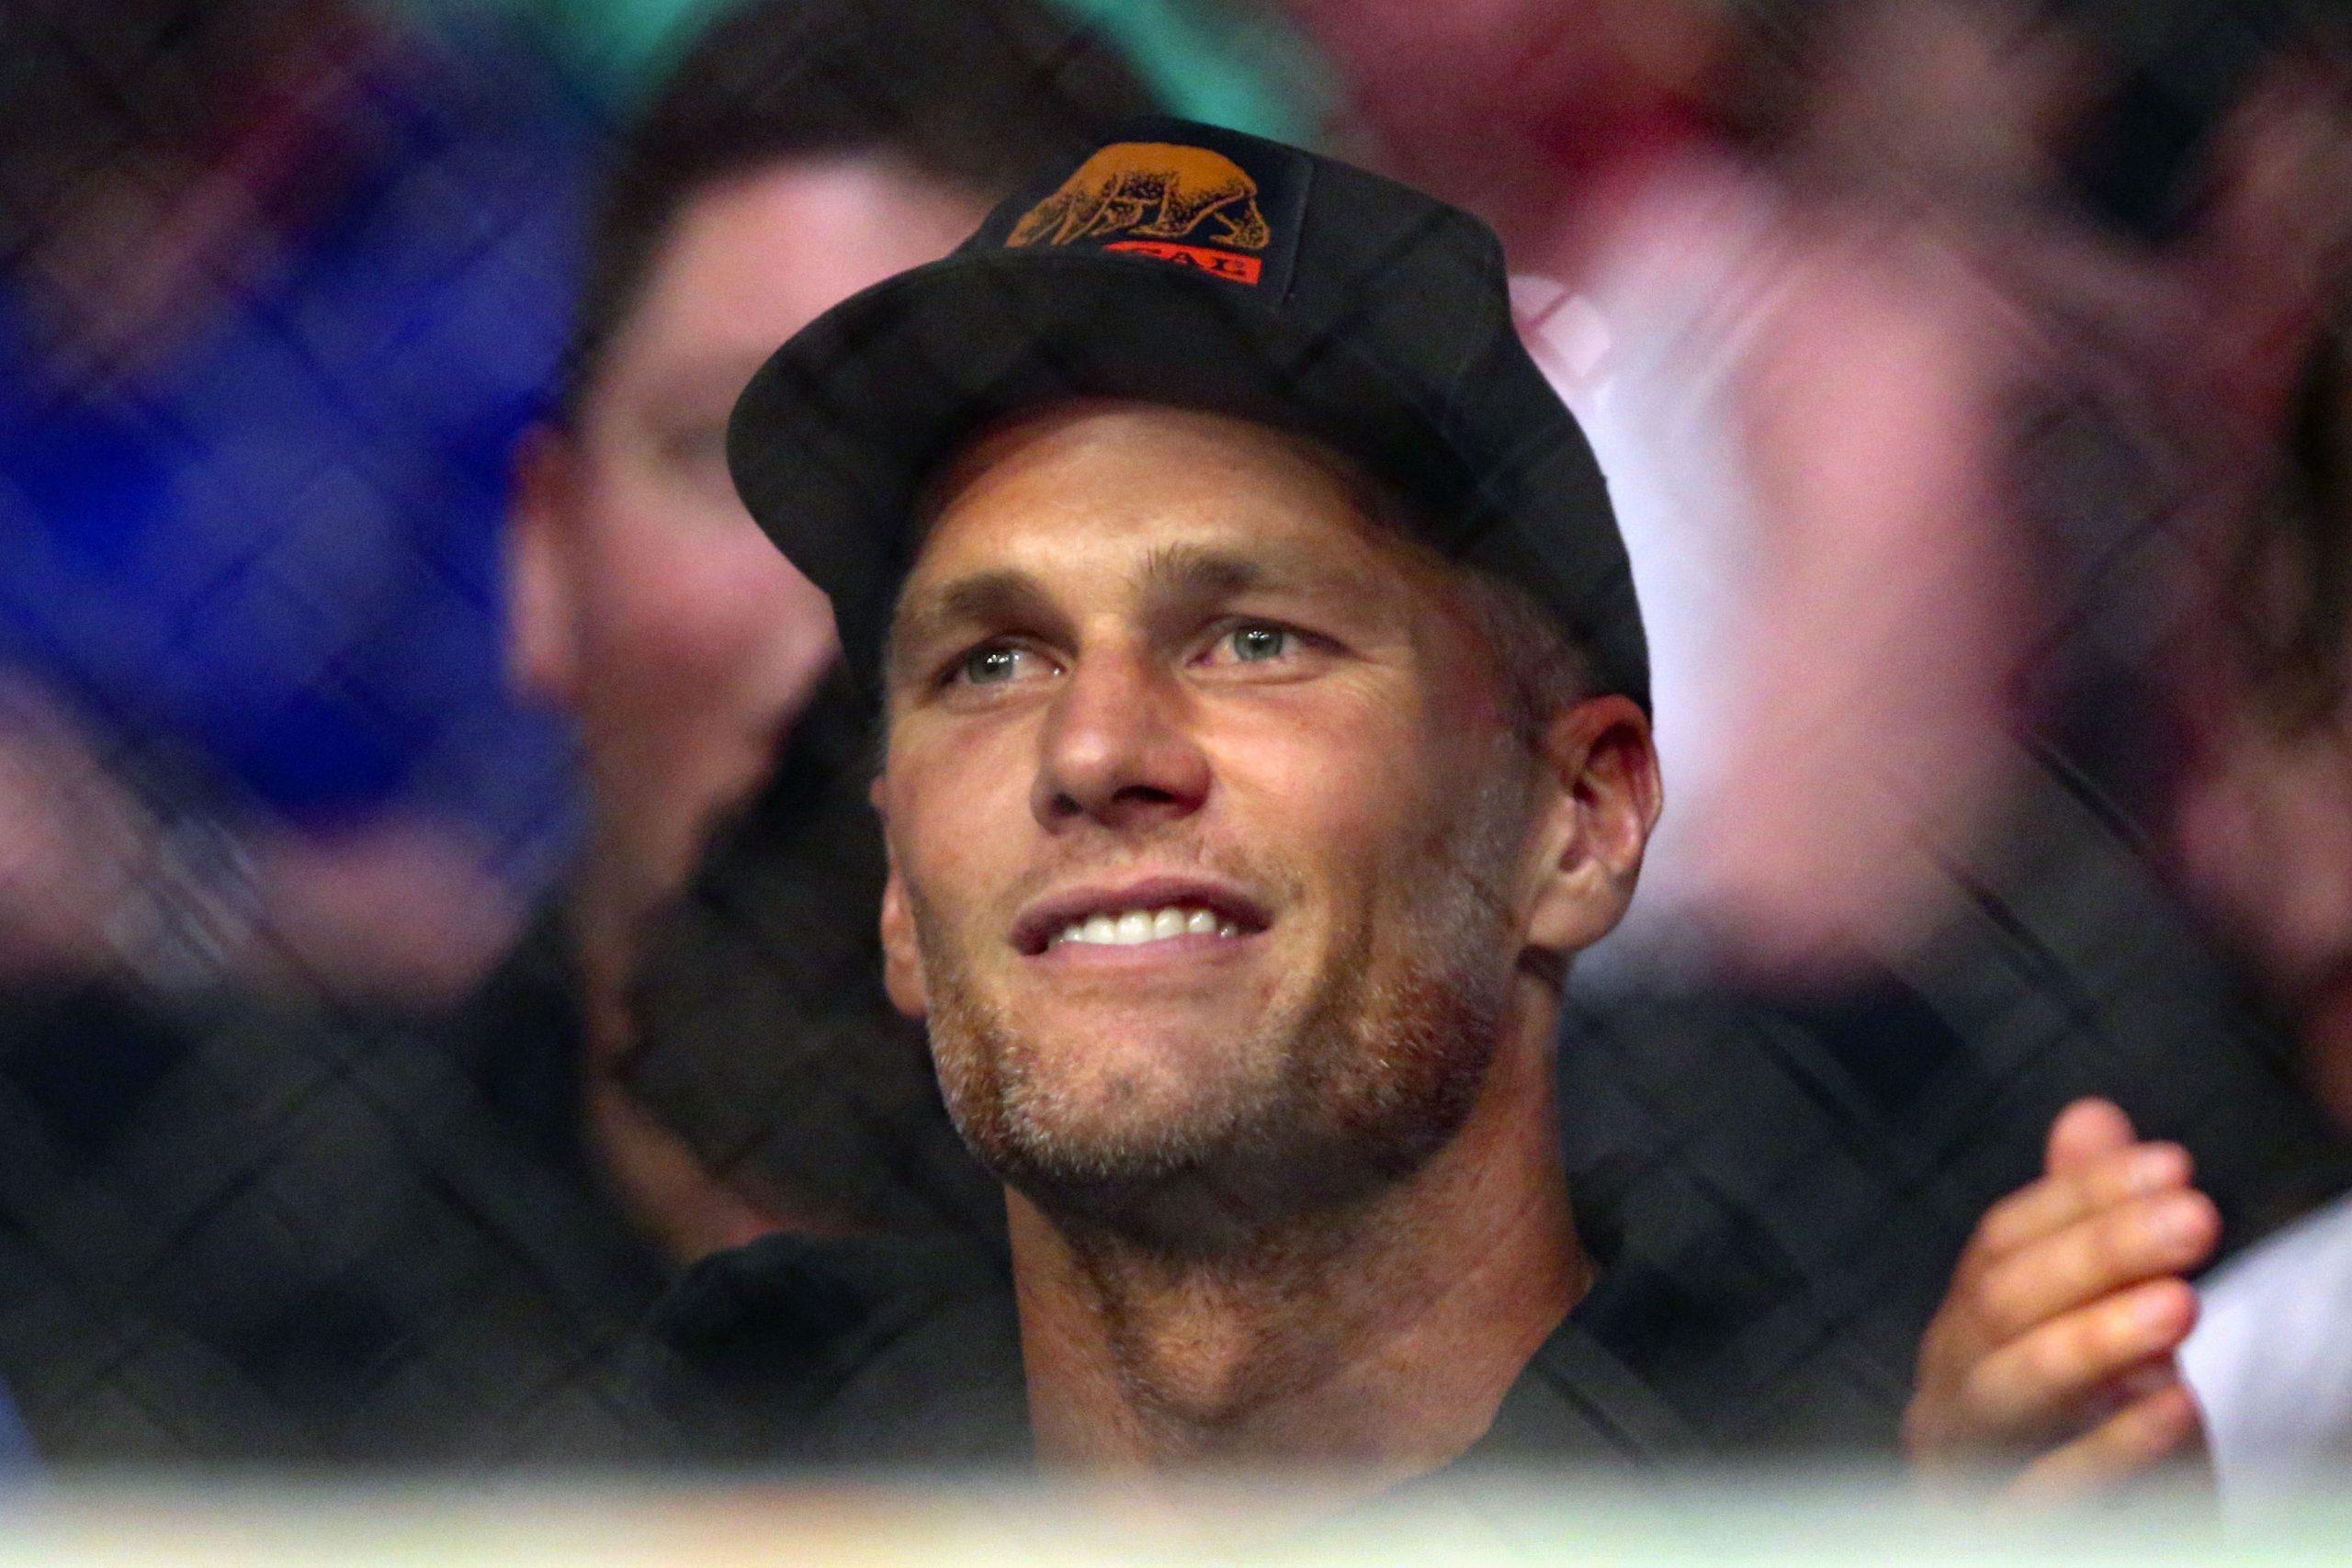 Tom Brady Trolls Aaron Rodgers, Packers with Bryson DeChambeau, Brooks Koepka Meme